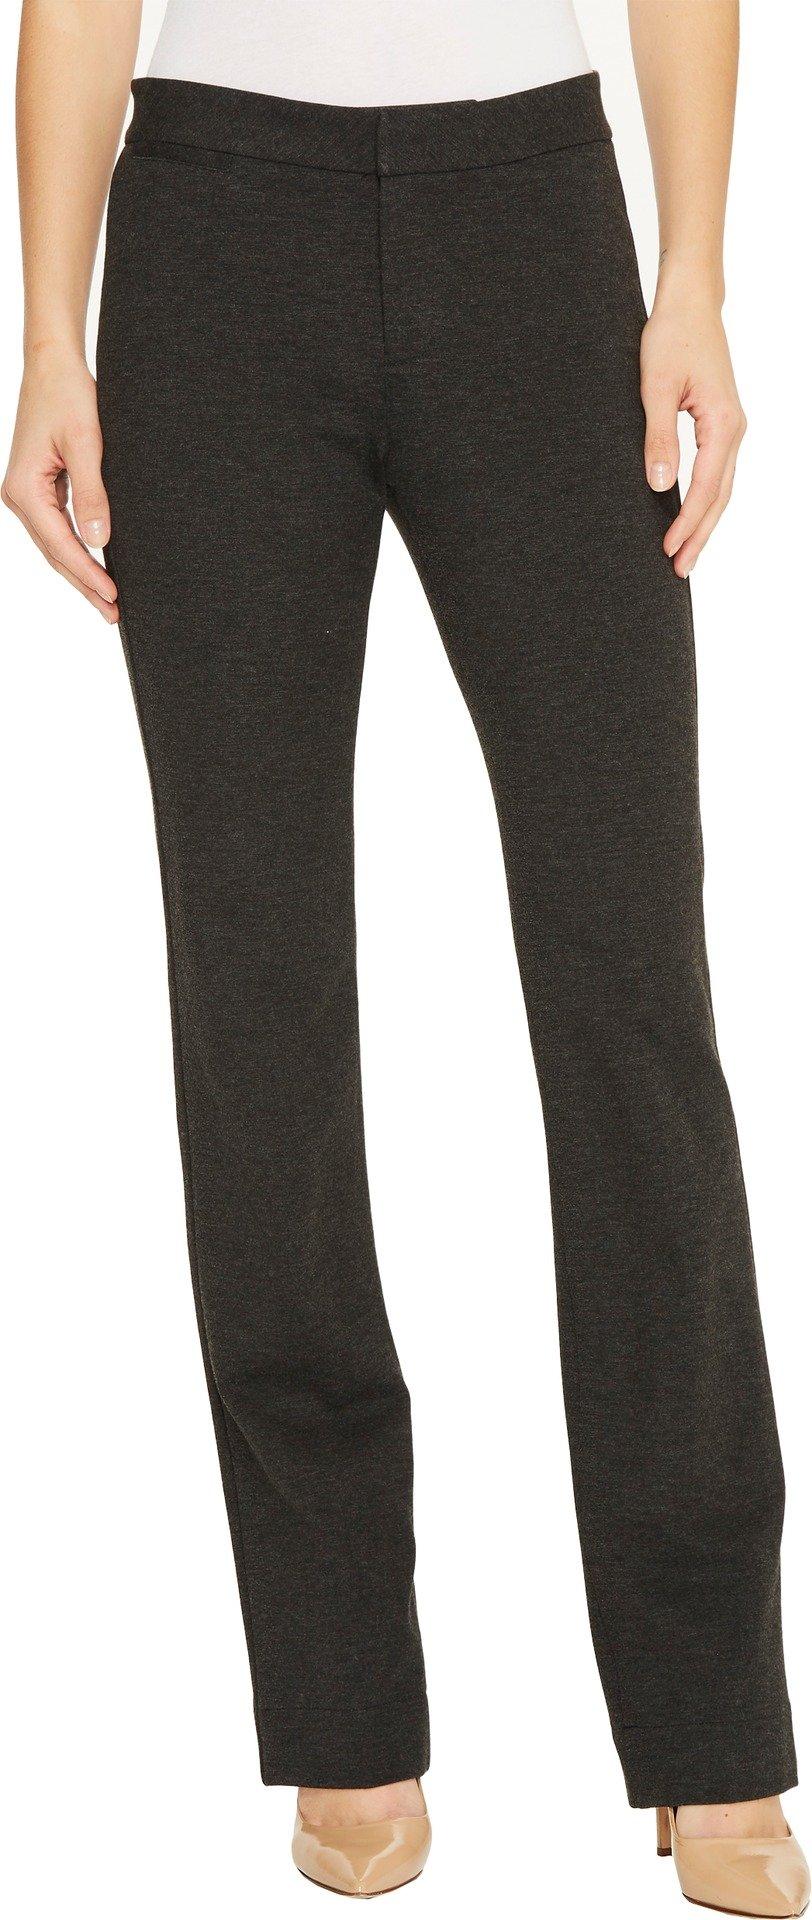 NYDJ Women's Ponte Trouser Pant, Charcoal/Heathered, 2